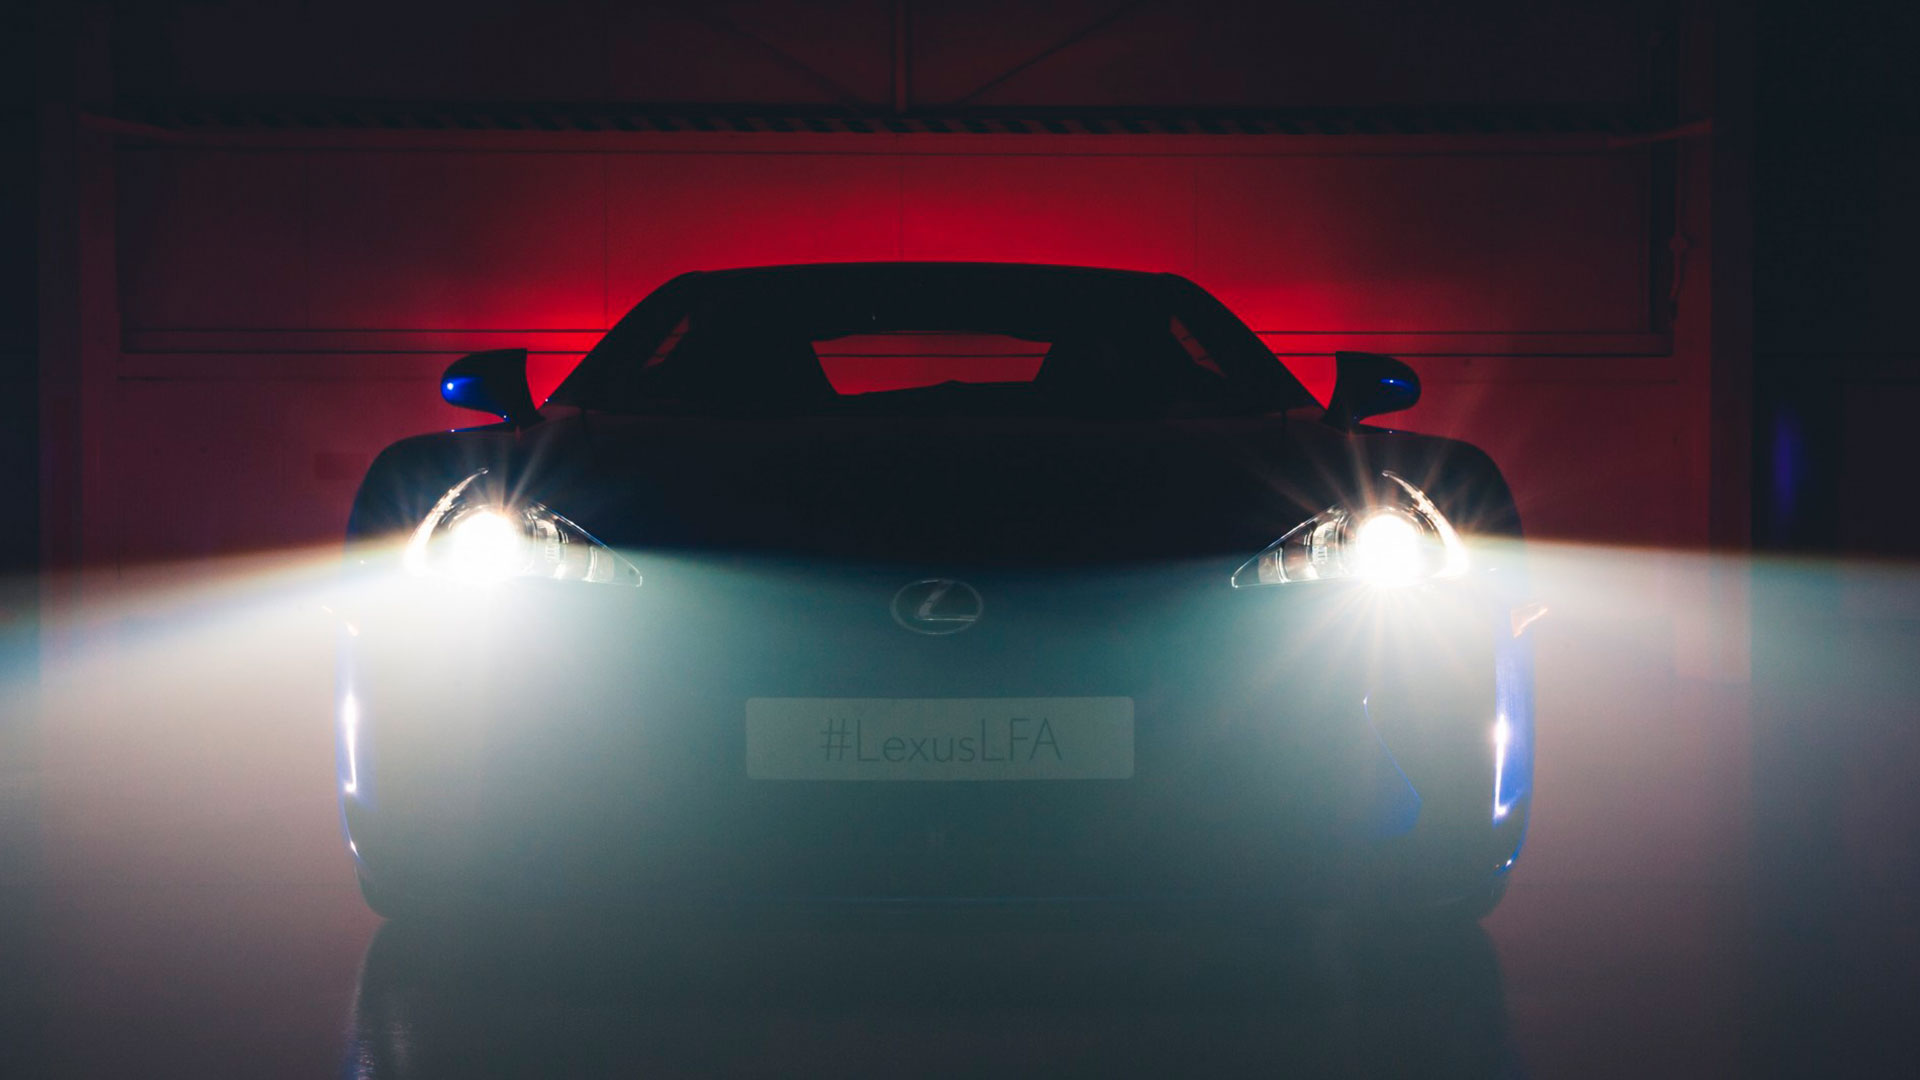 El Lexus LFA hero asset